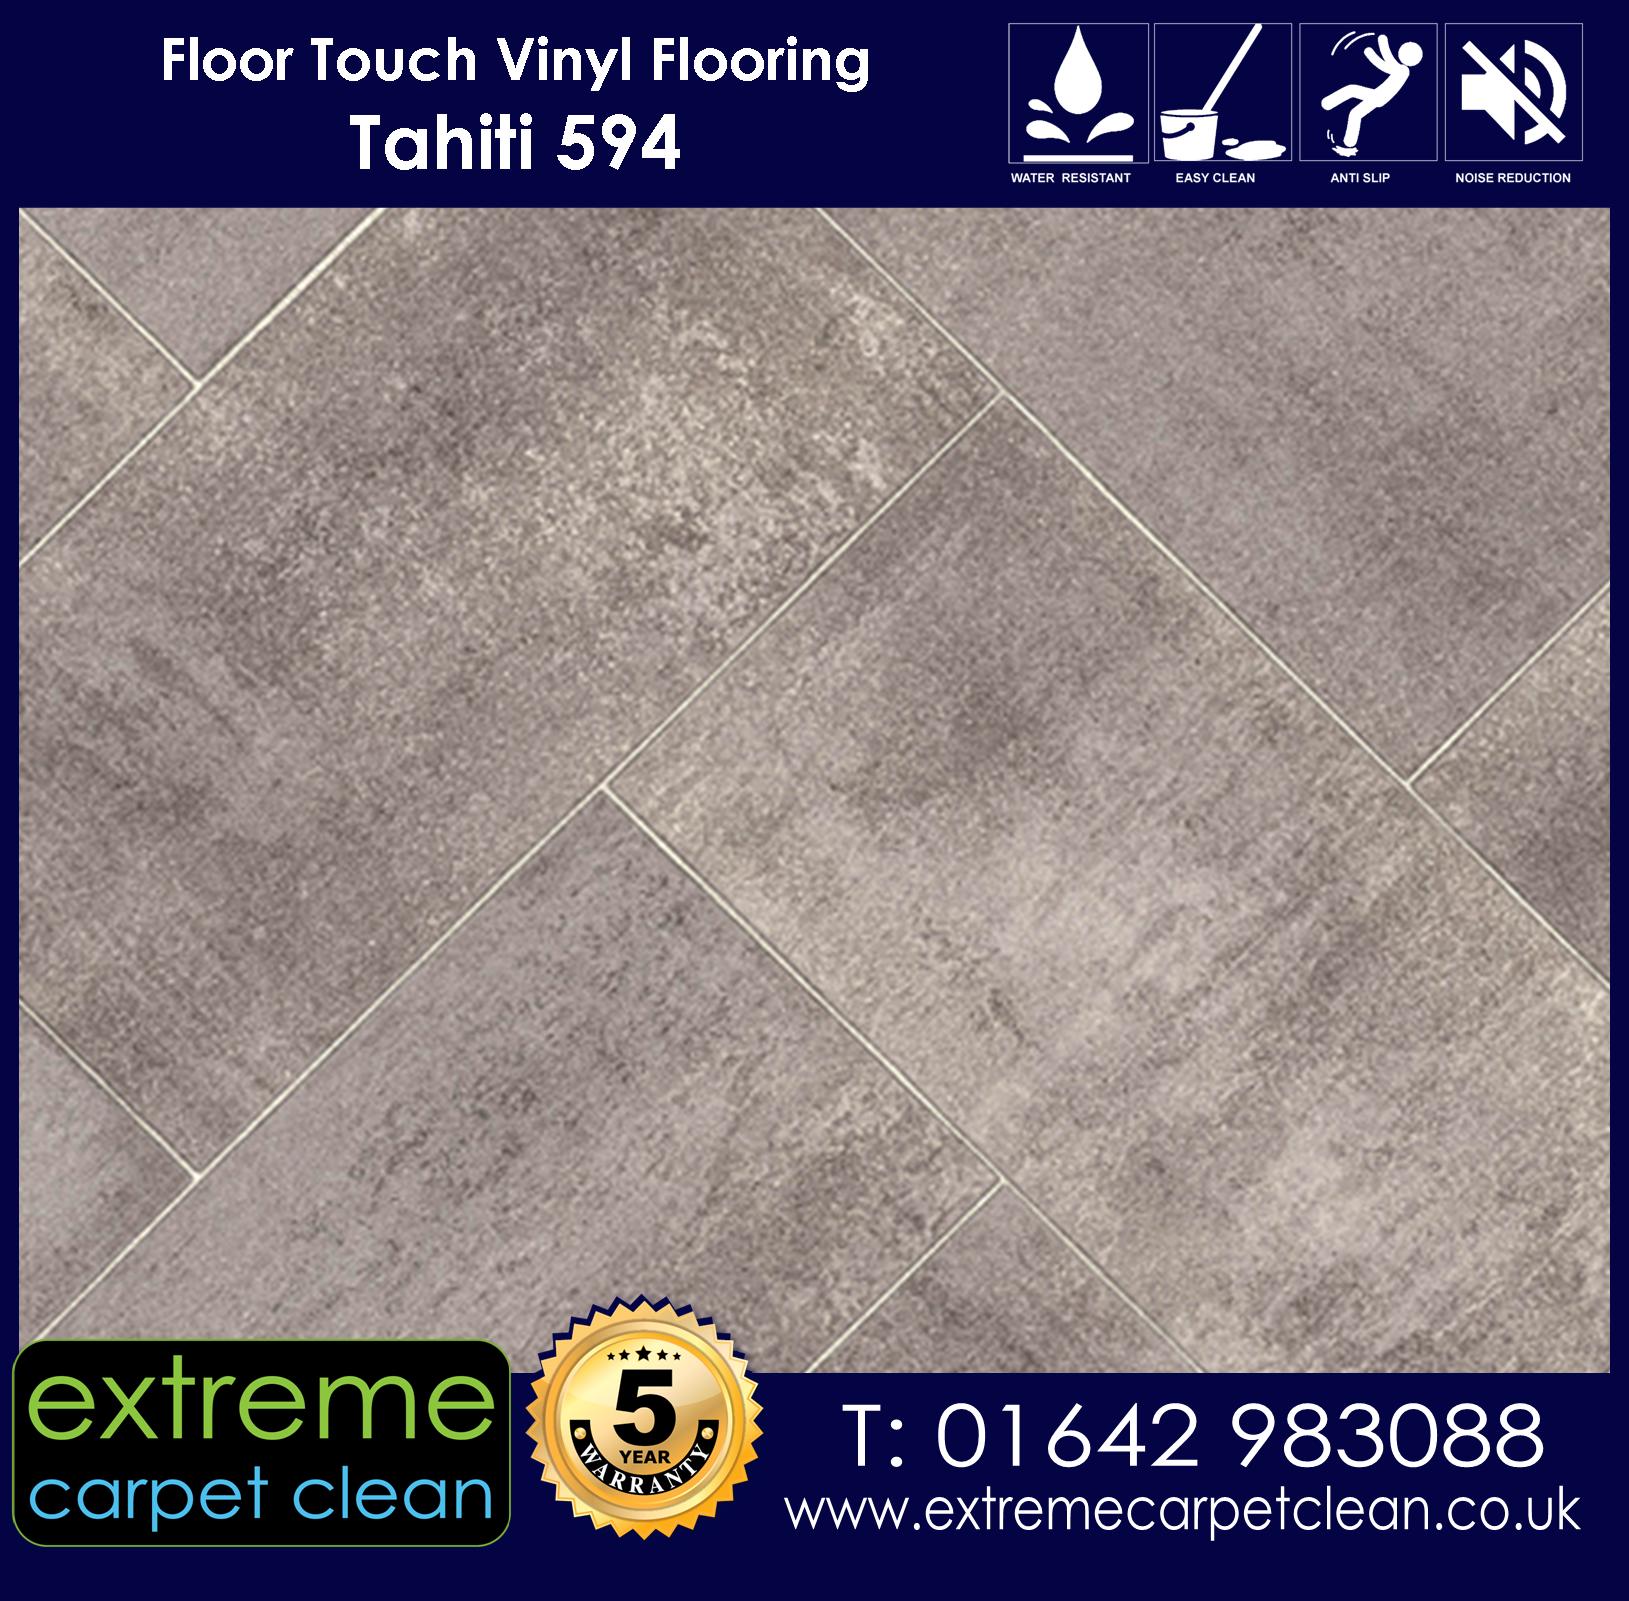 Extreme Carpet Clean. Vinyl Flooring. Tahiti 594